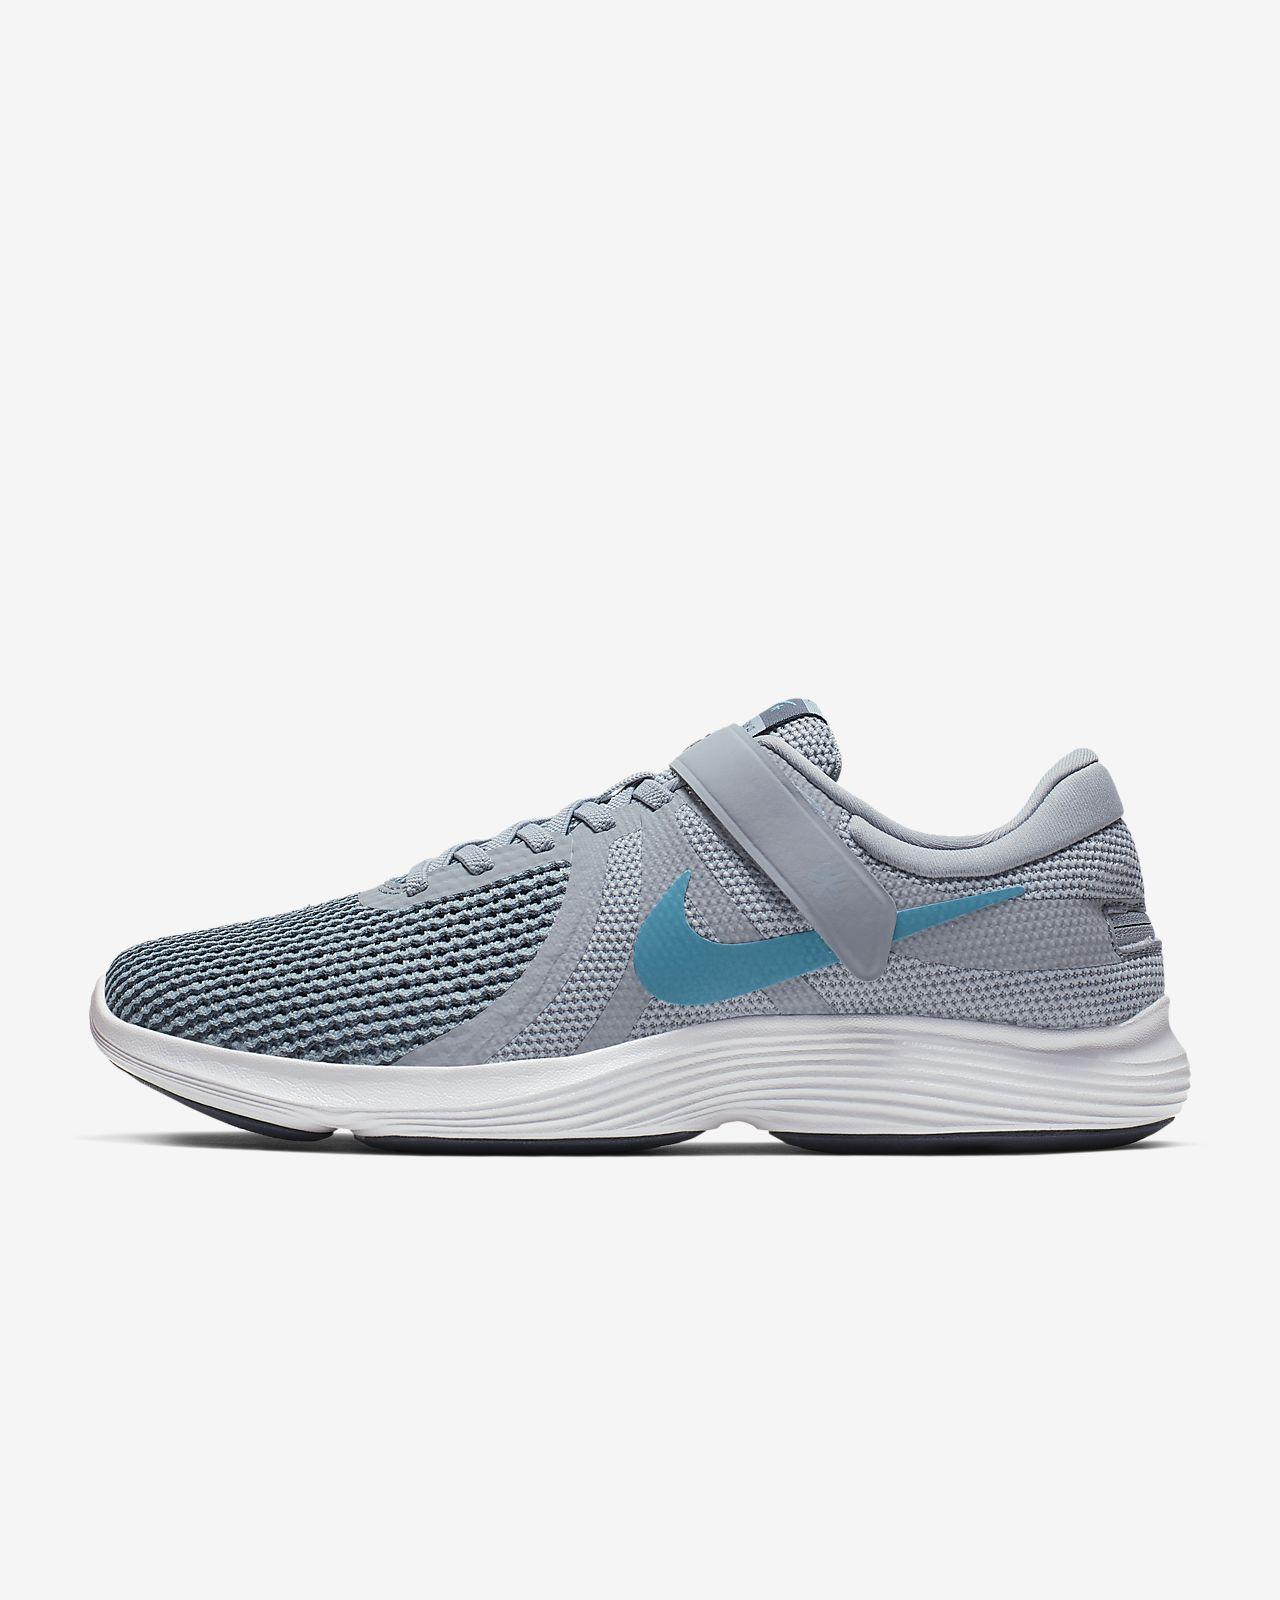 f269aa05 Мужские беговые кроссовки Nike Revolution 4 FlyEase. Nike.com RU